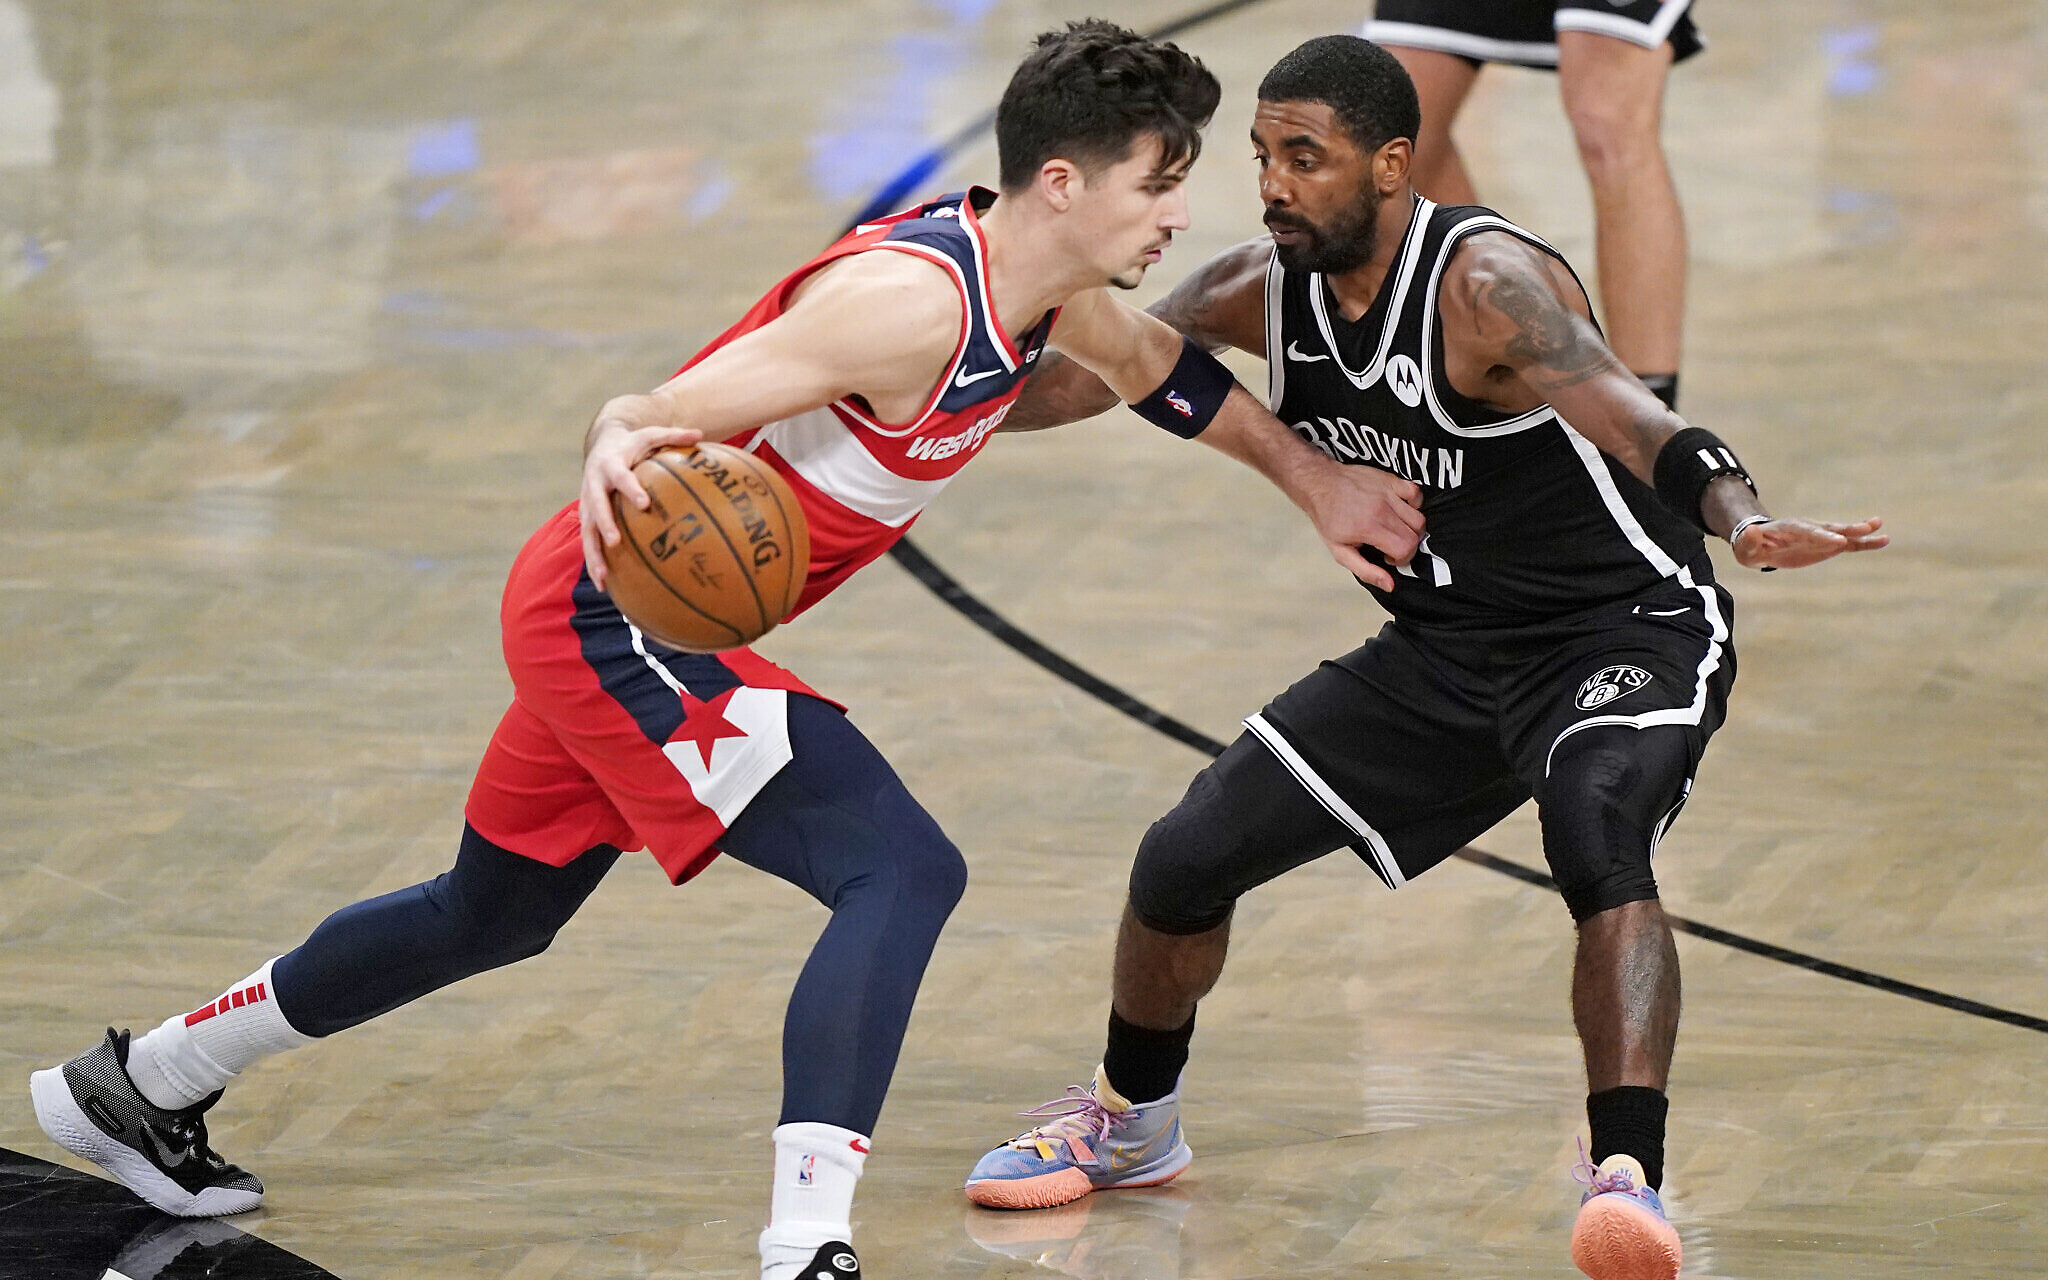 Turkish Airlines EuroLeague, Маккаби Тель-Авив, НБА, драфт НБА, Дени Авдия, Вашингтон